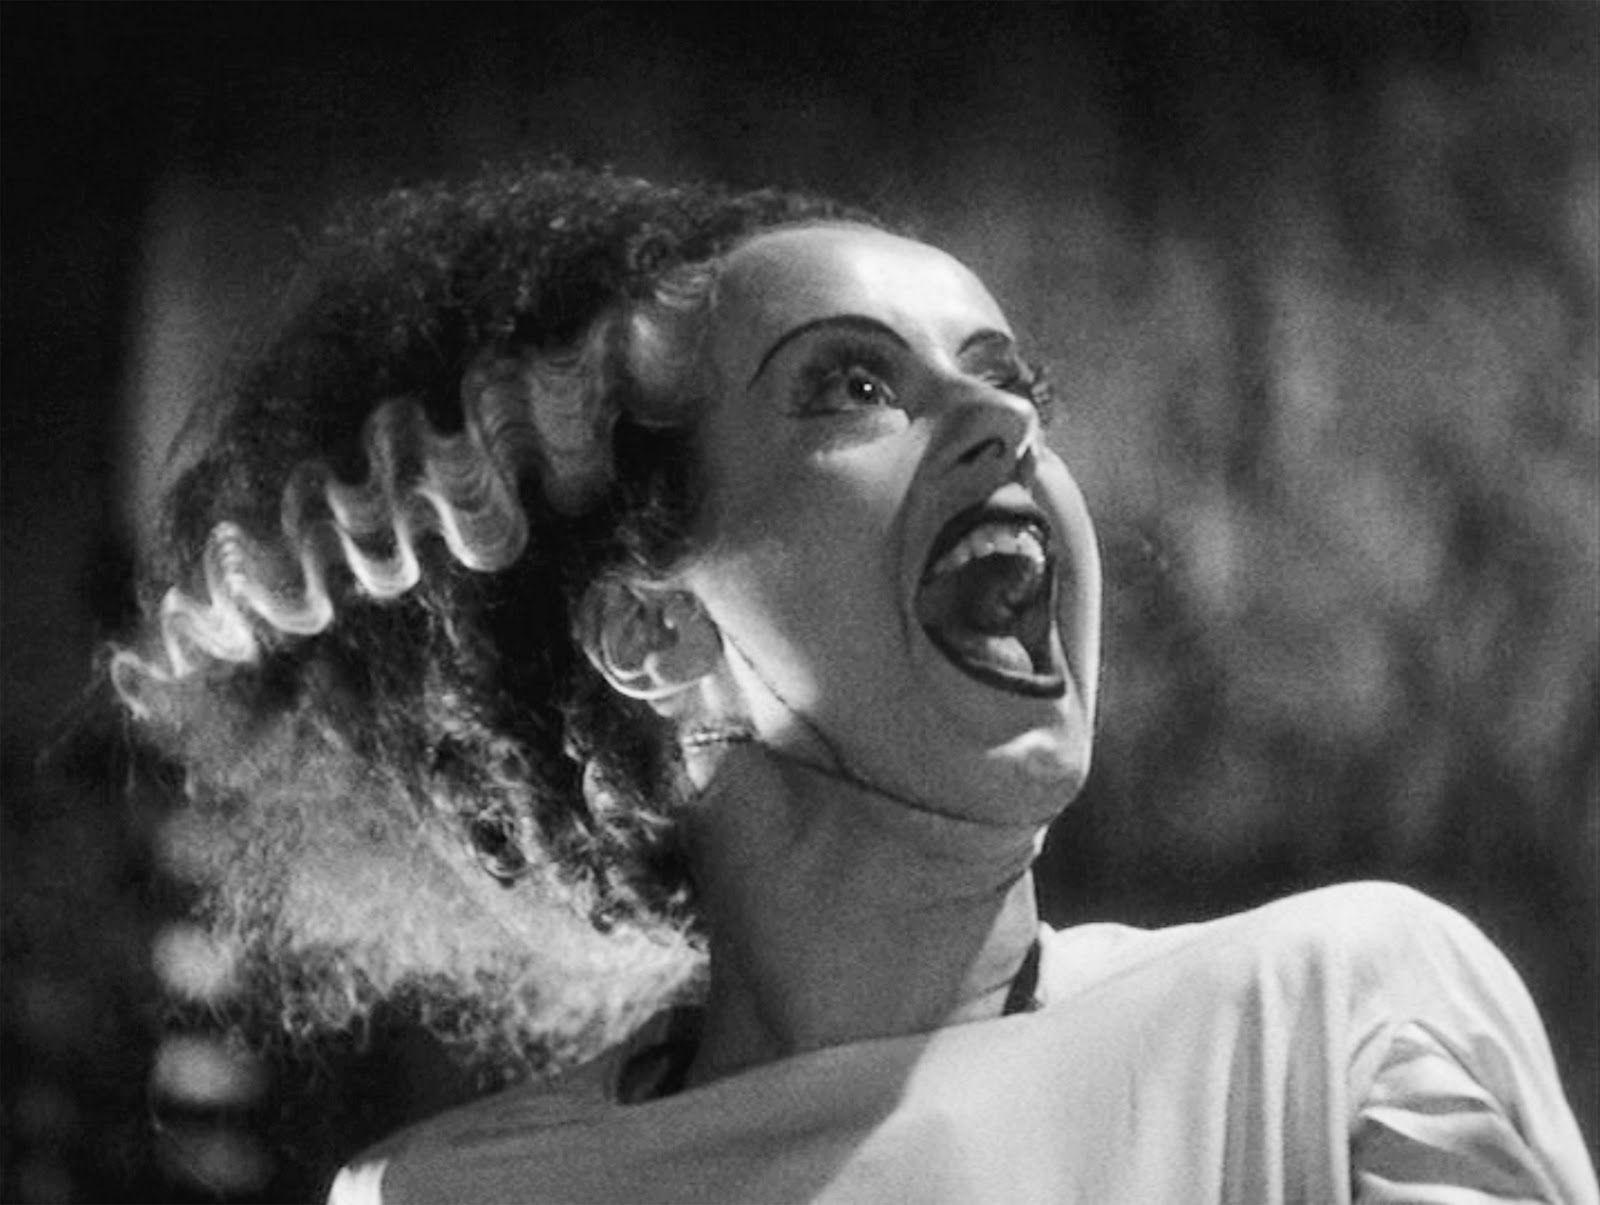 Bride of Frankenstein, played by Elsa Lanchester